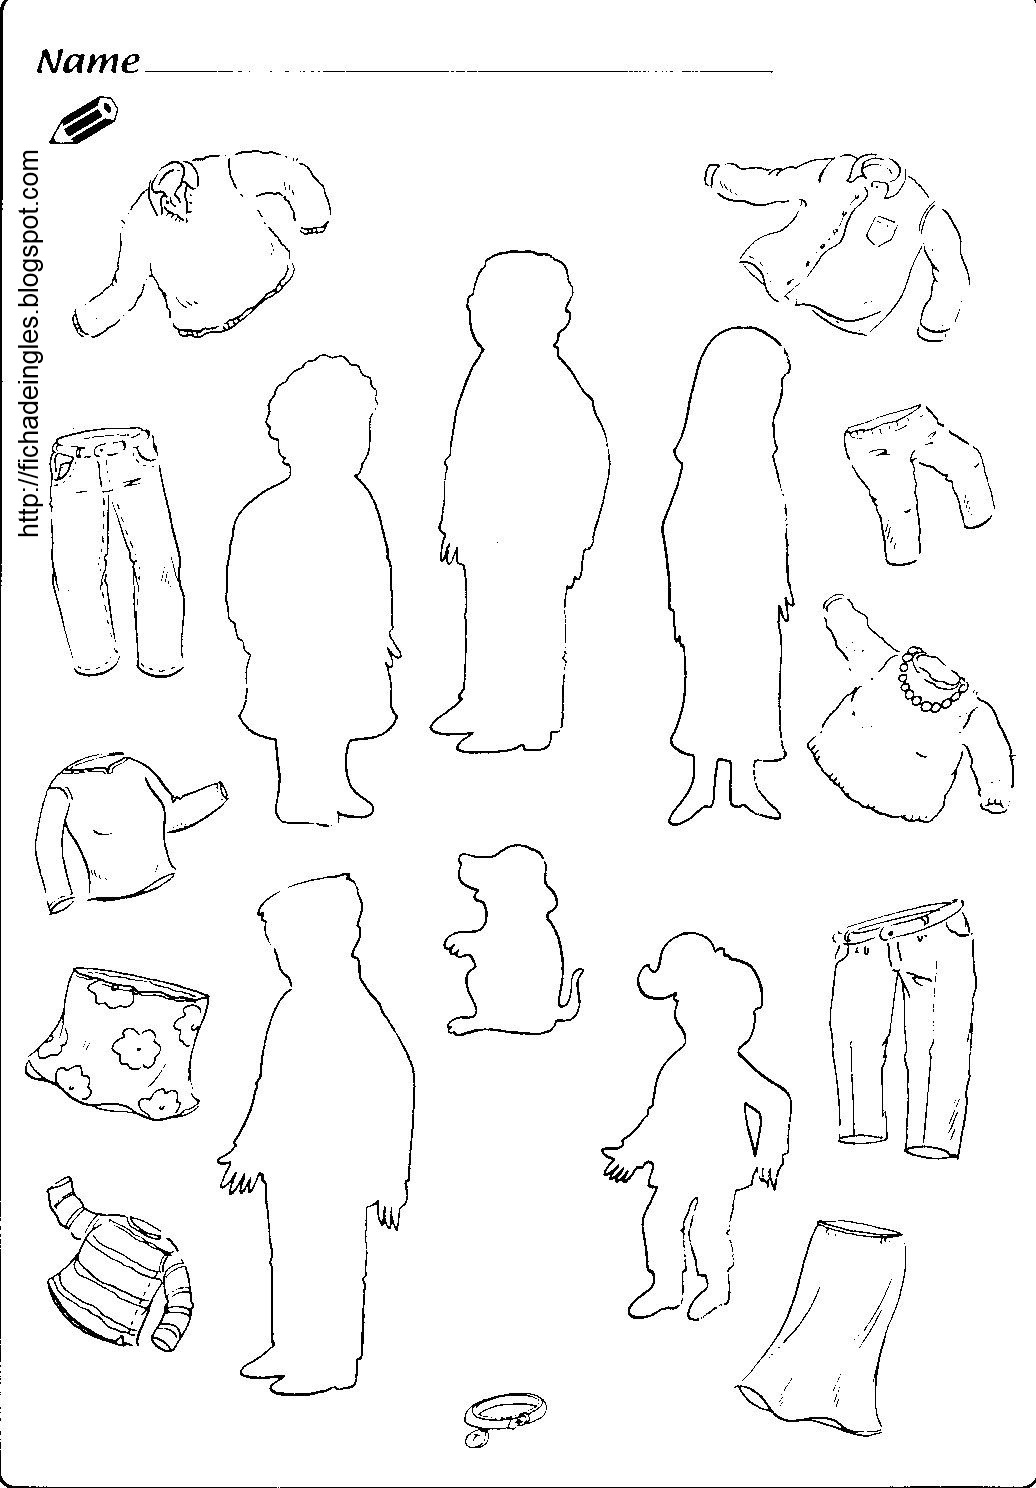 la familia worksheet pdf new calendar template site. Black Bedroom Furniture Sets. Home Design Ideas